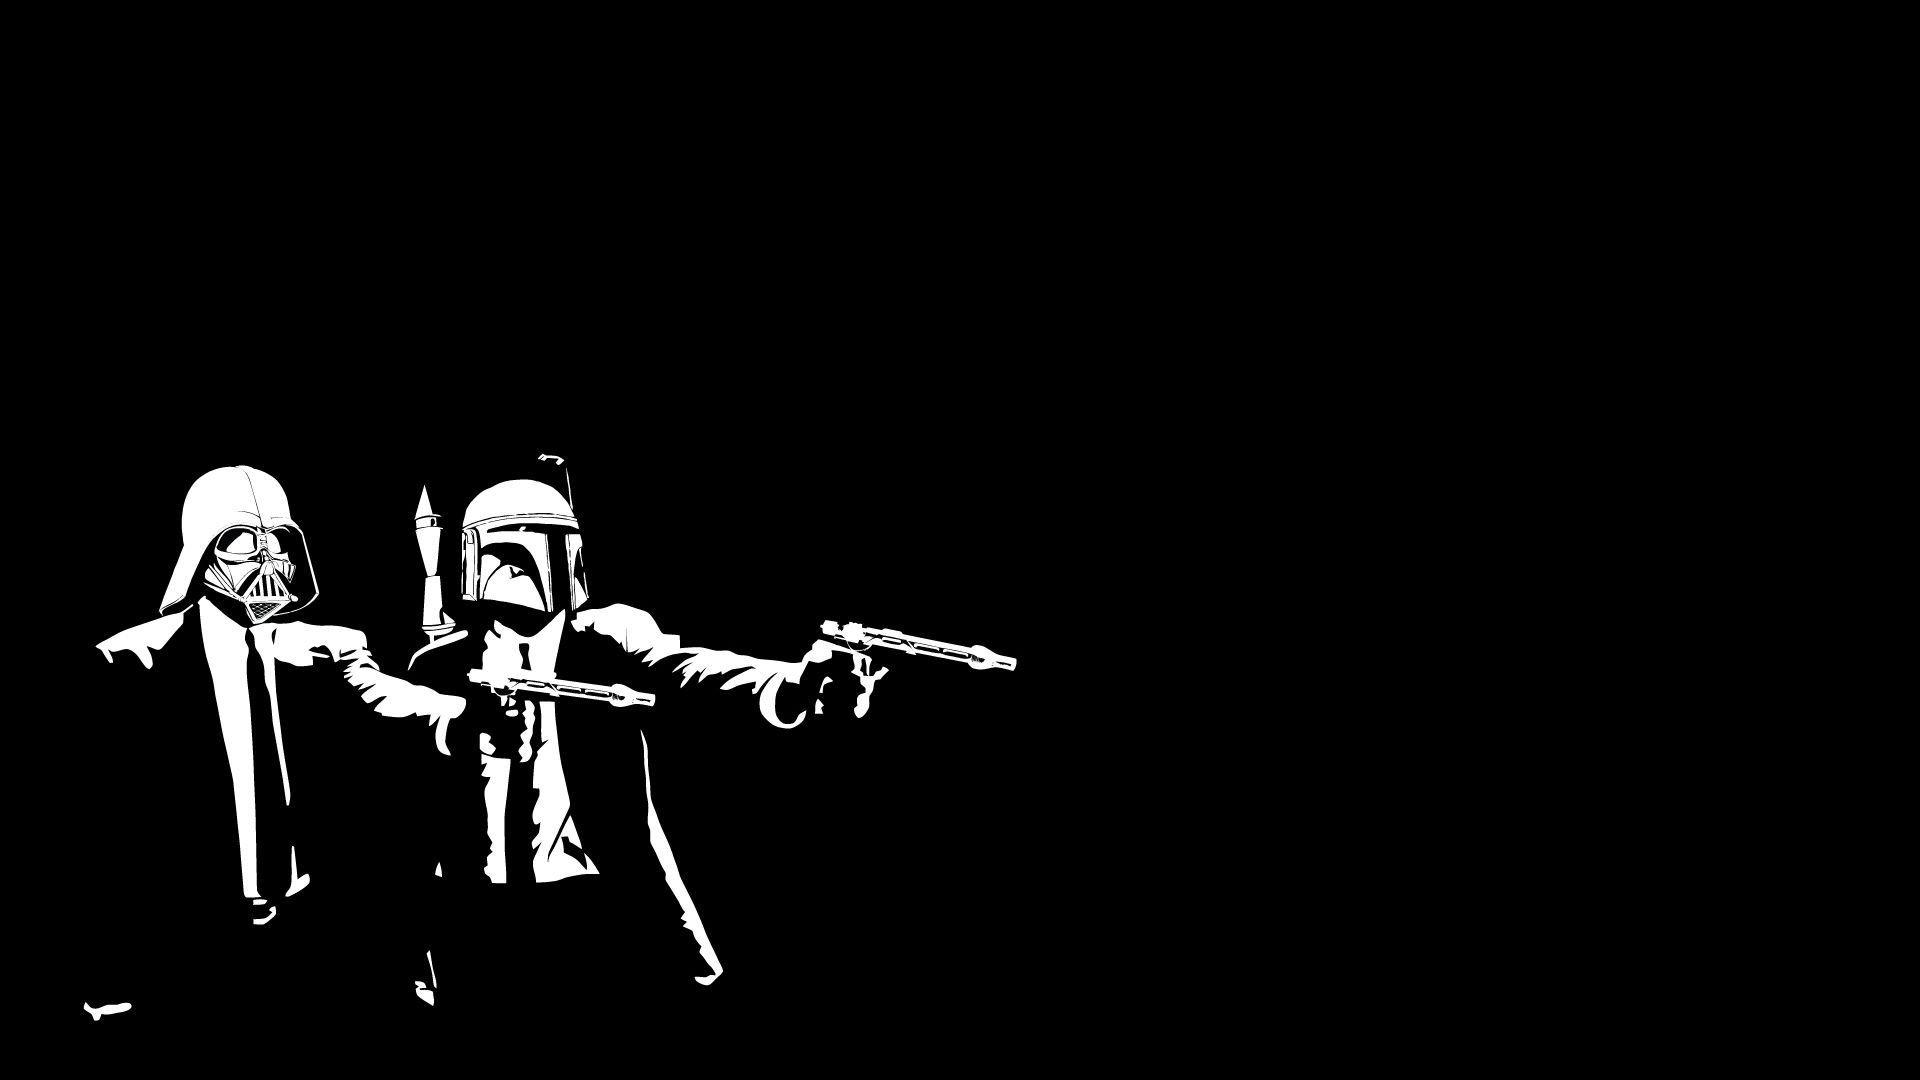 44 Star Wars Pulp Fiction Wallpaper On Wallpapersafari